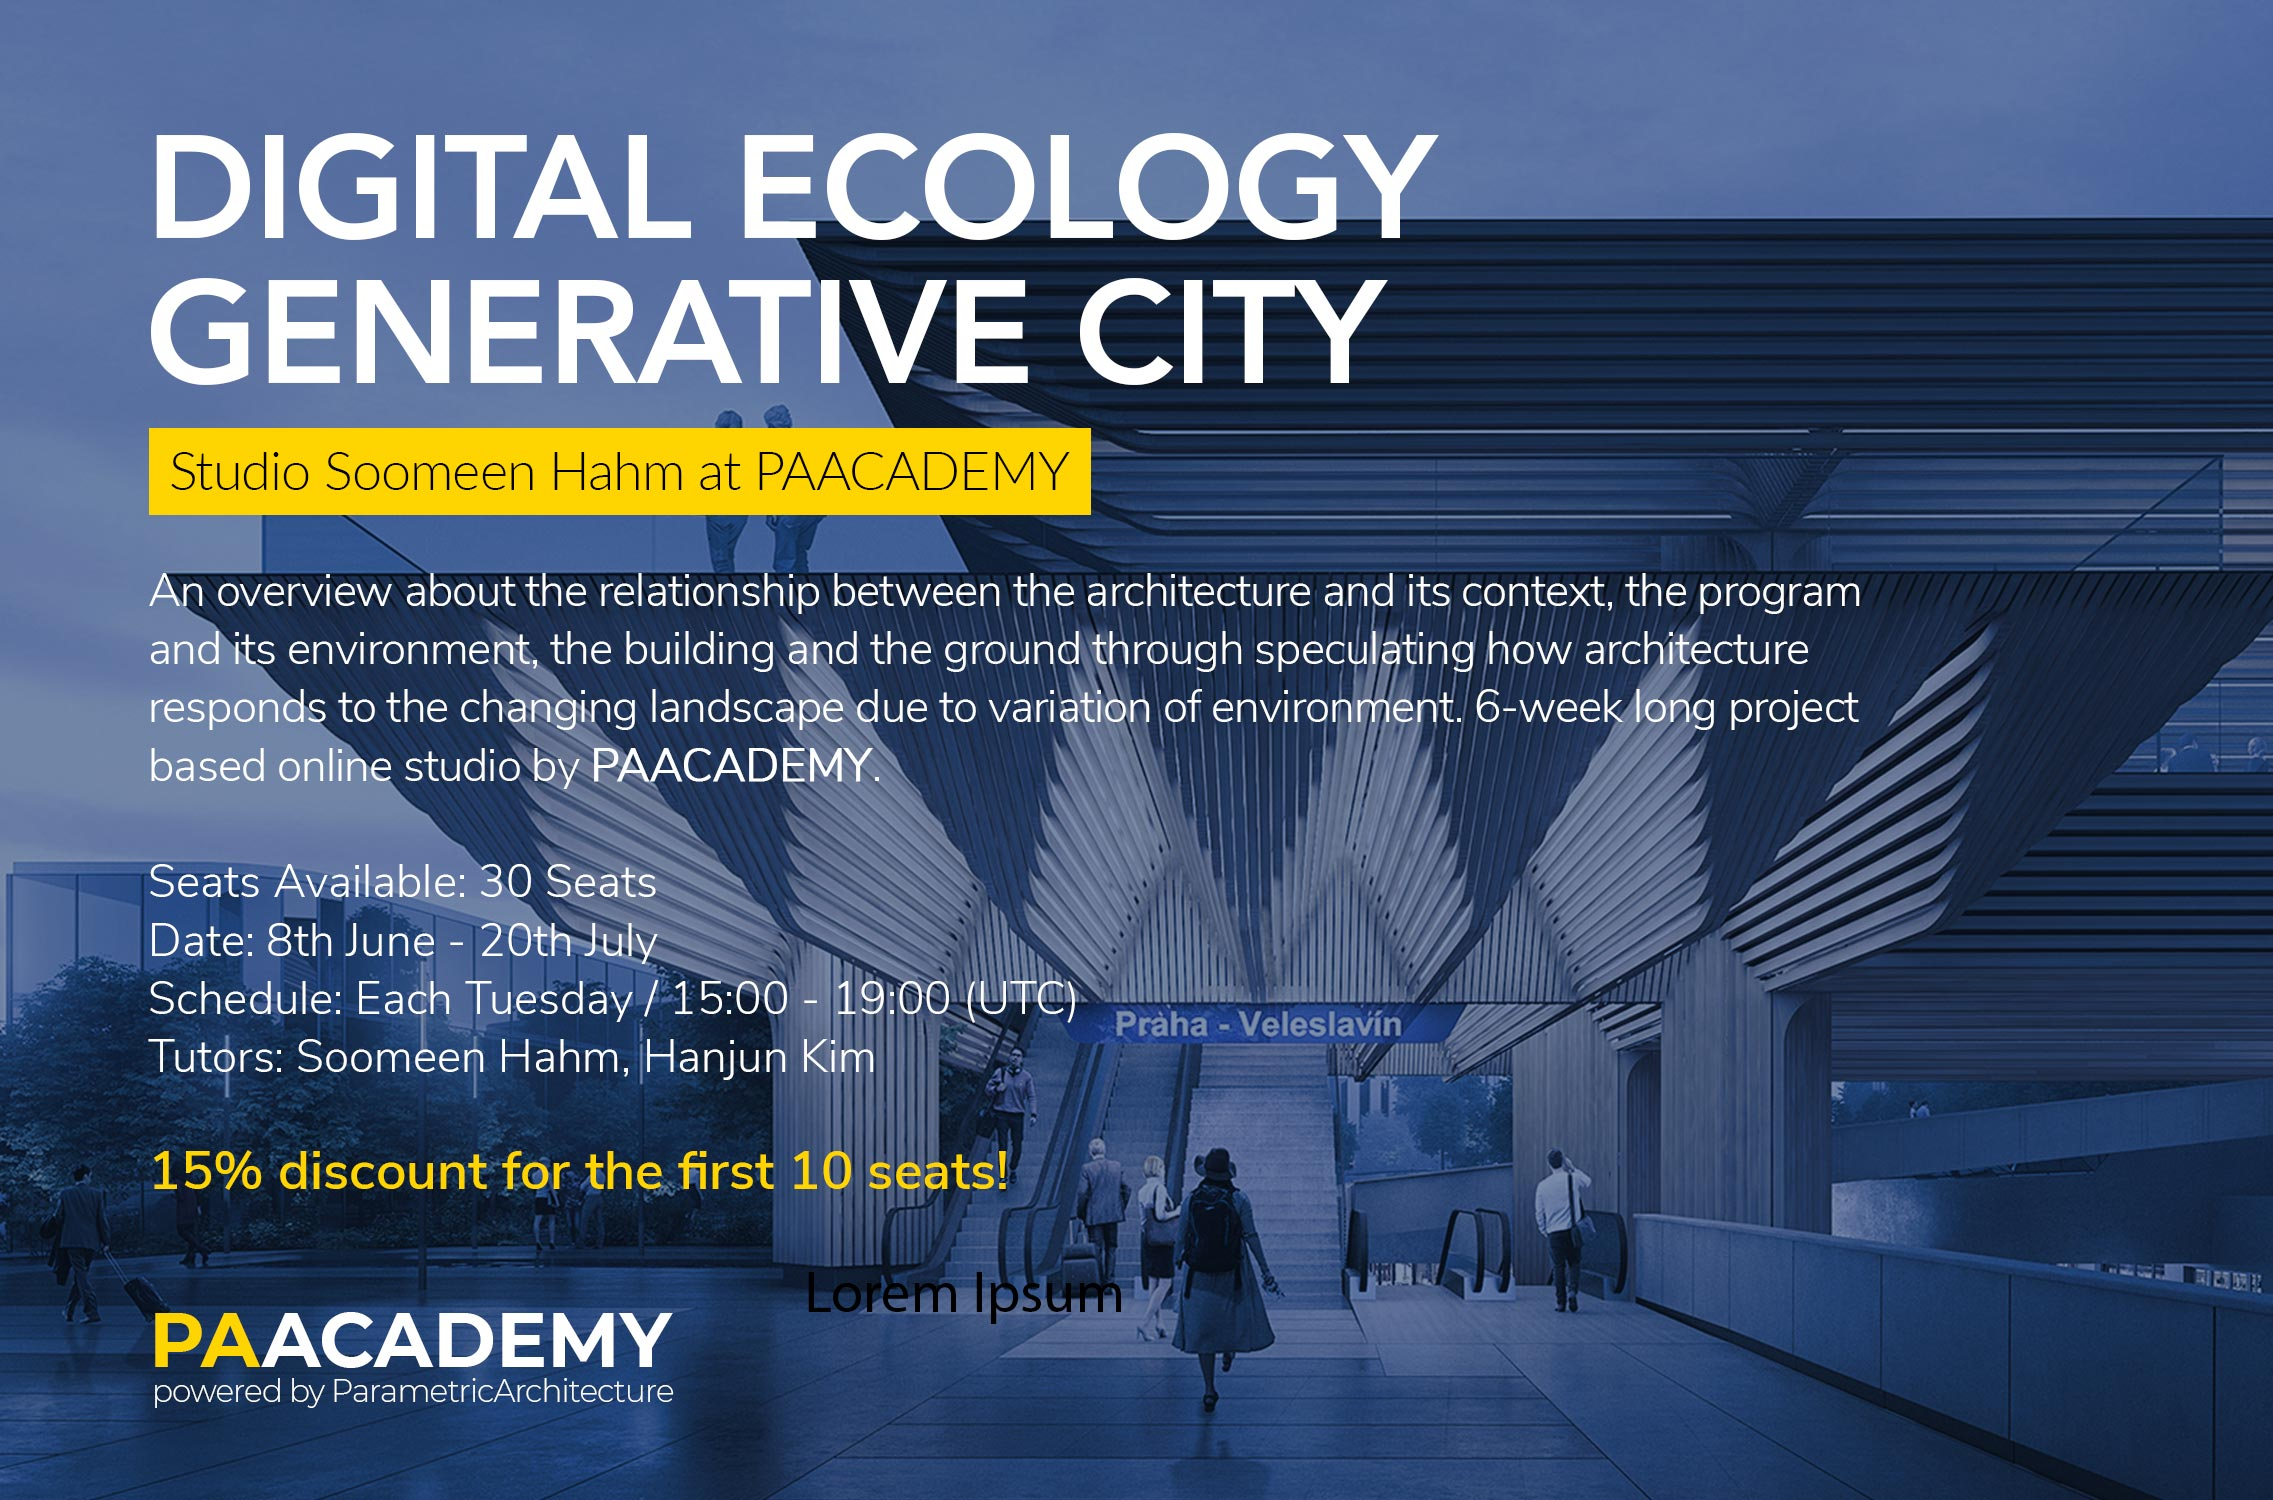 Digital Ecology - Generative City / PAACADEMY